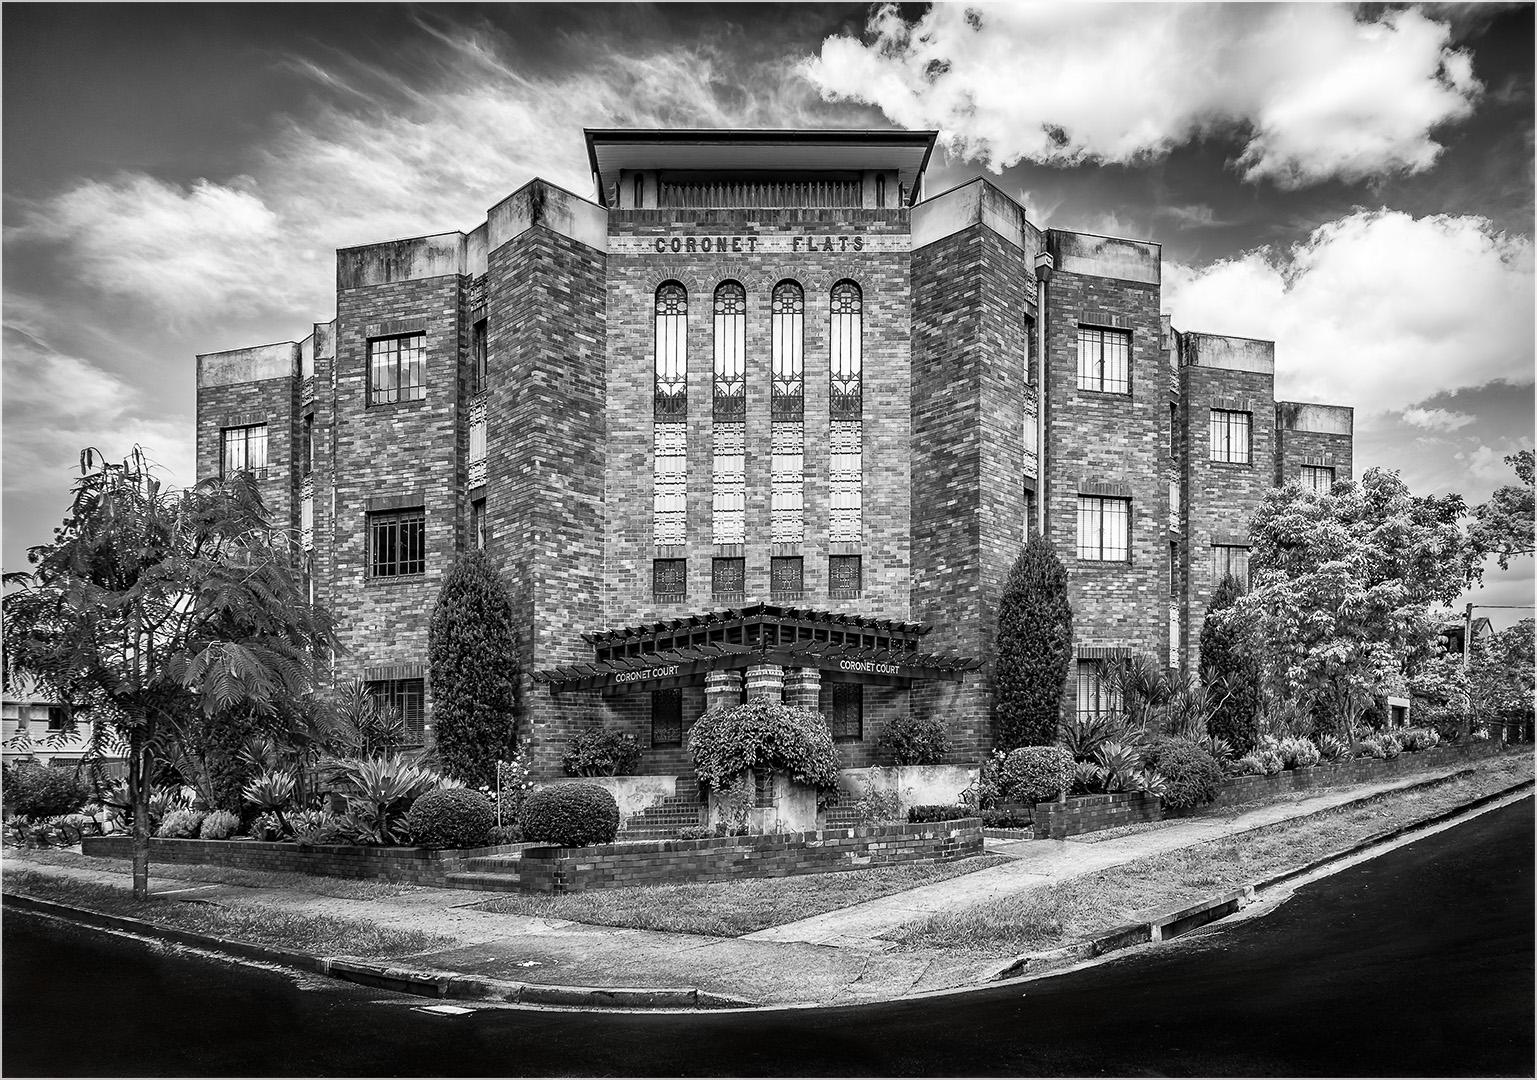 Architecture_Coronet Court, 1930s Art Deco, New Farm_Anne Pappalardo_Agr_Merit